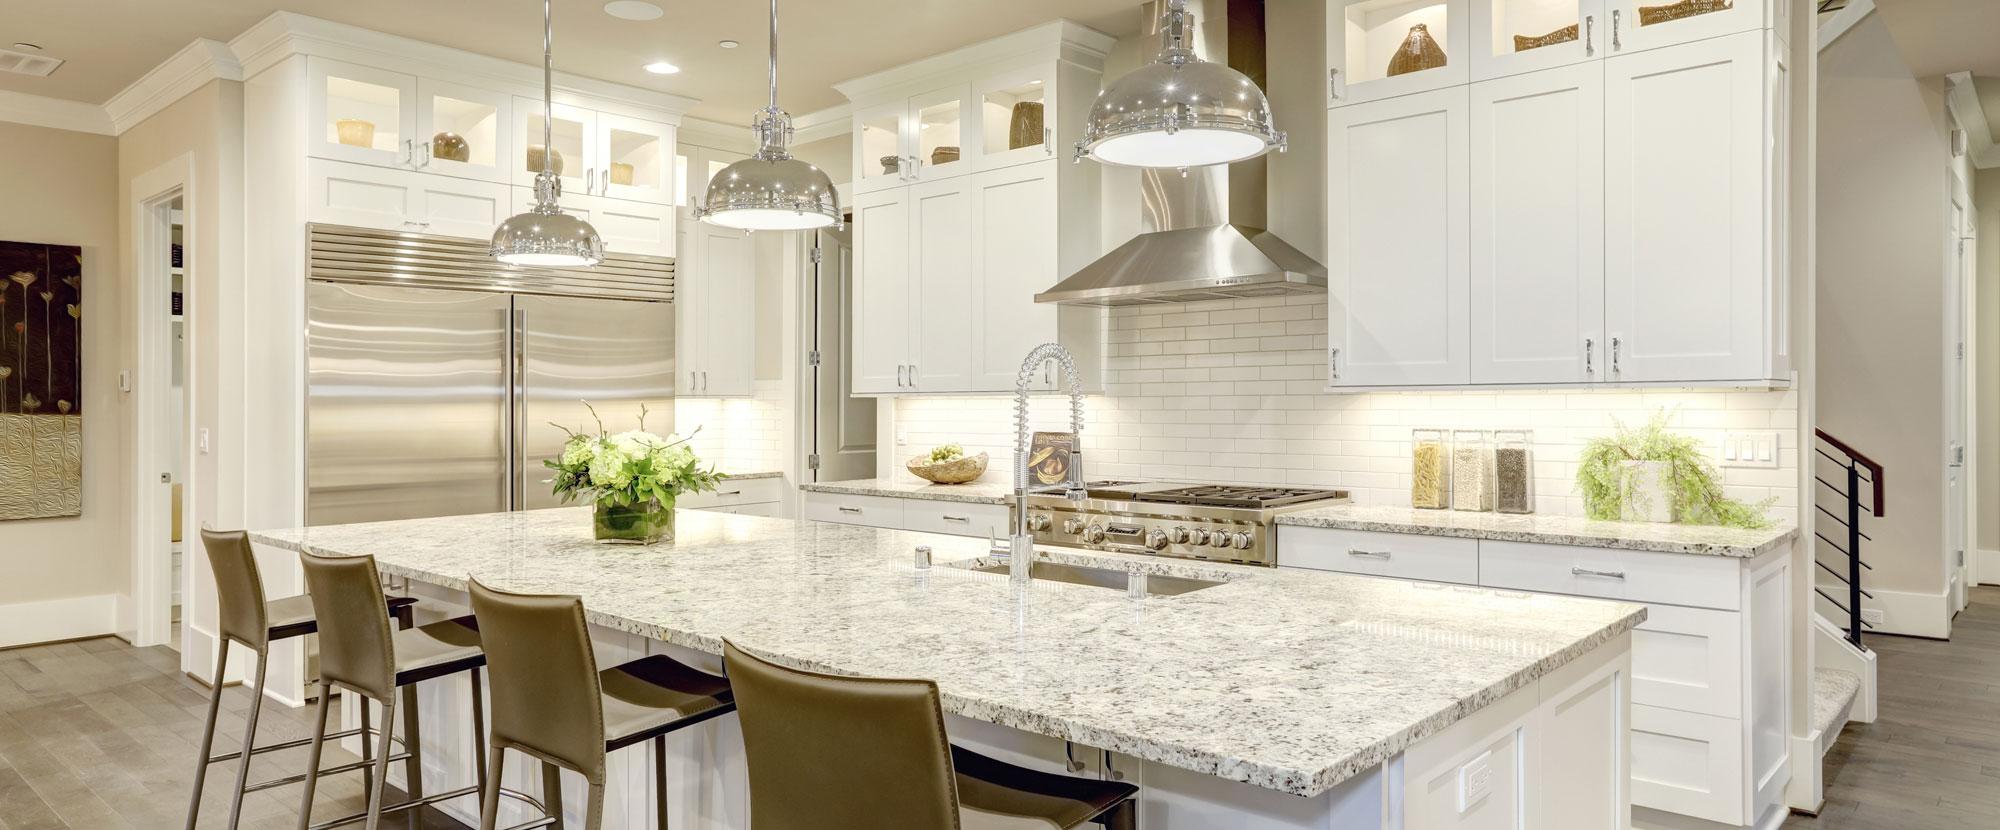 Kitchen Cabinet Syracuse Ny Besto Blog & Modern Kitchens Of Syracuse | Kitchen Cabinets Syracuse Concepts In Wood